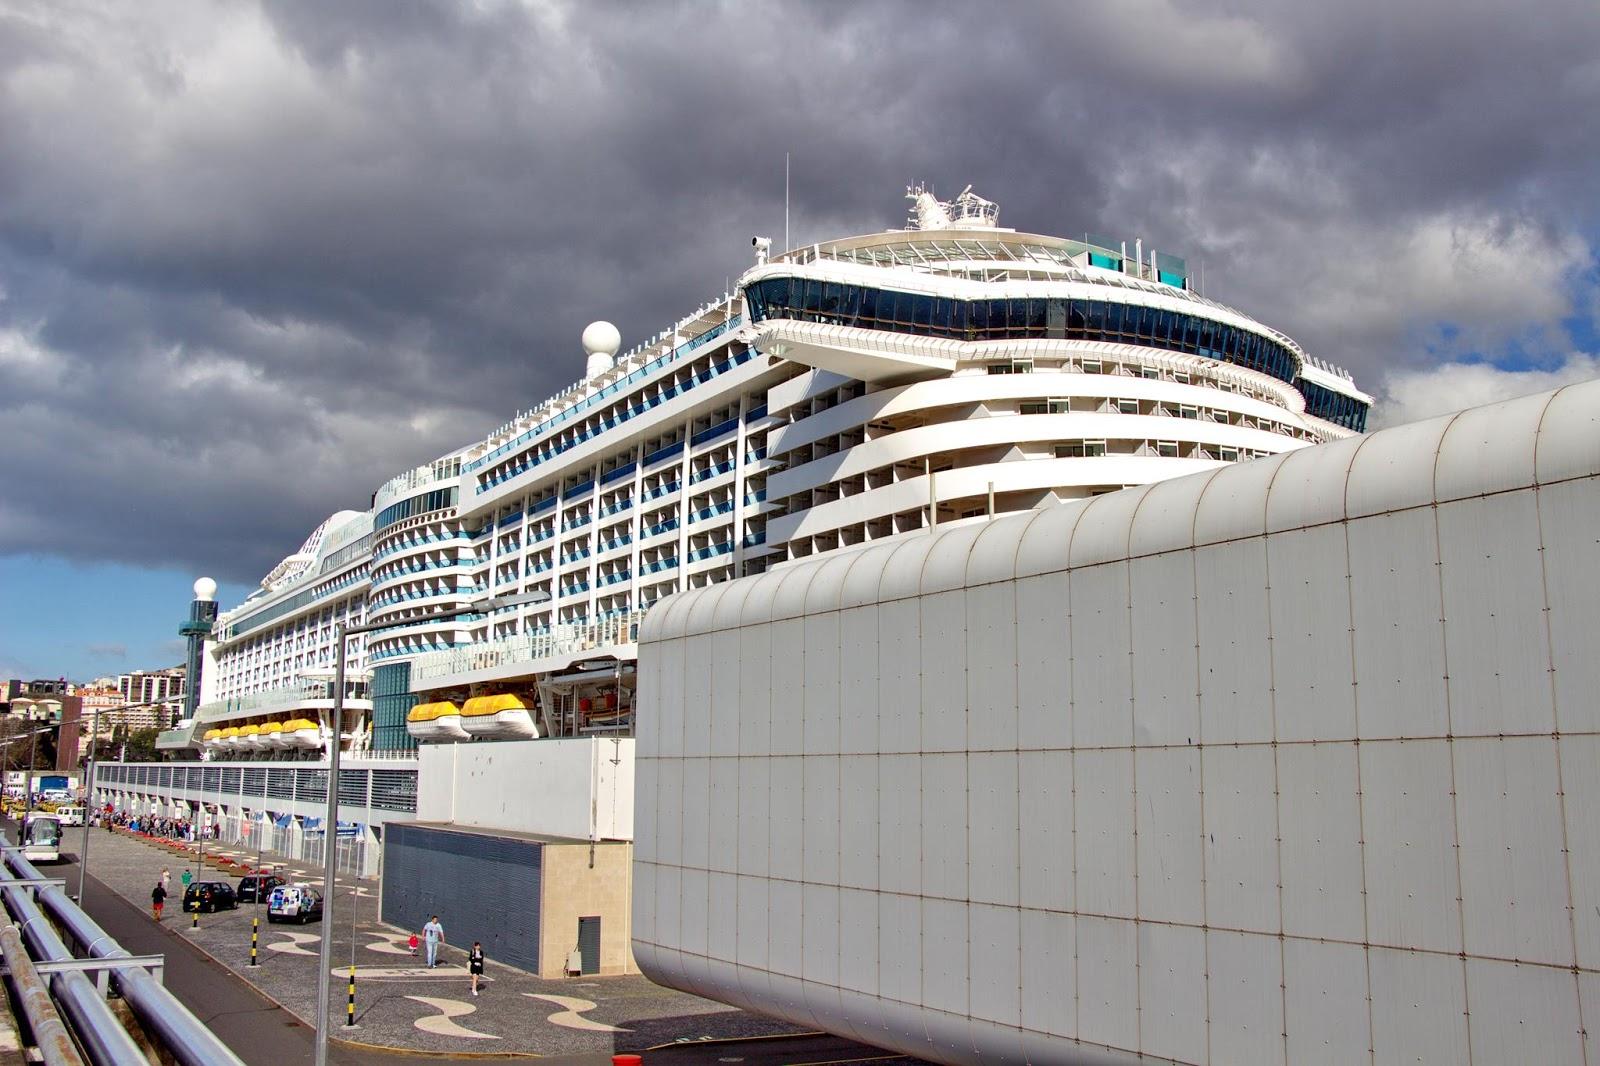 o paquete e a gare marítima